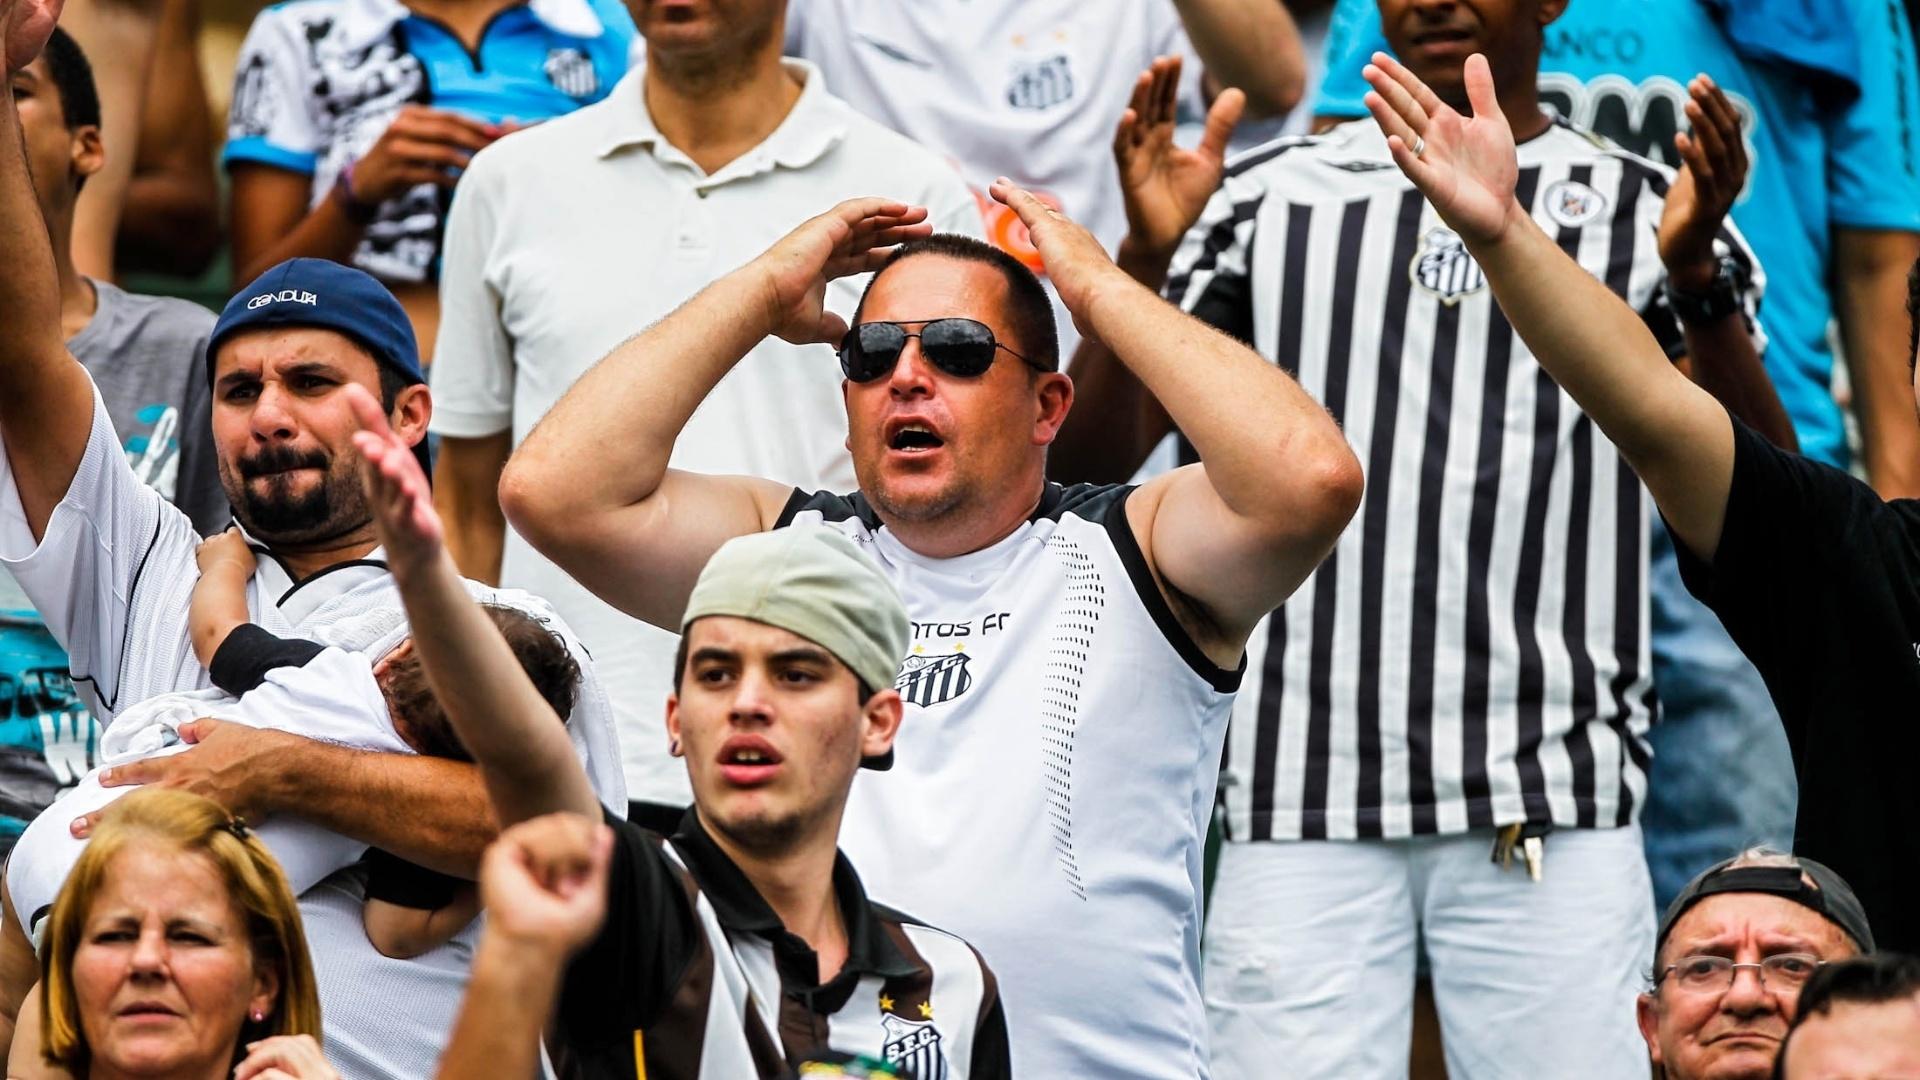 25.jan.2013 - Torcedor do Santos lamenta chance perdida pela equipe na final da Copa SP